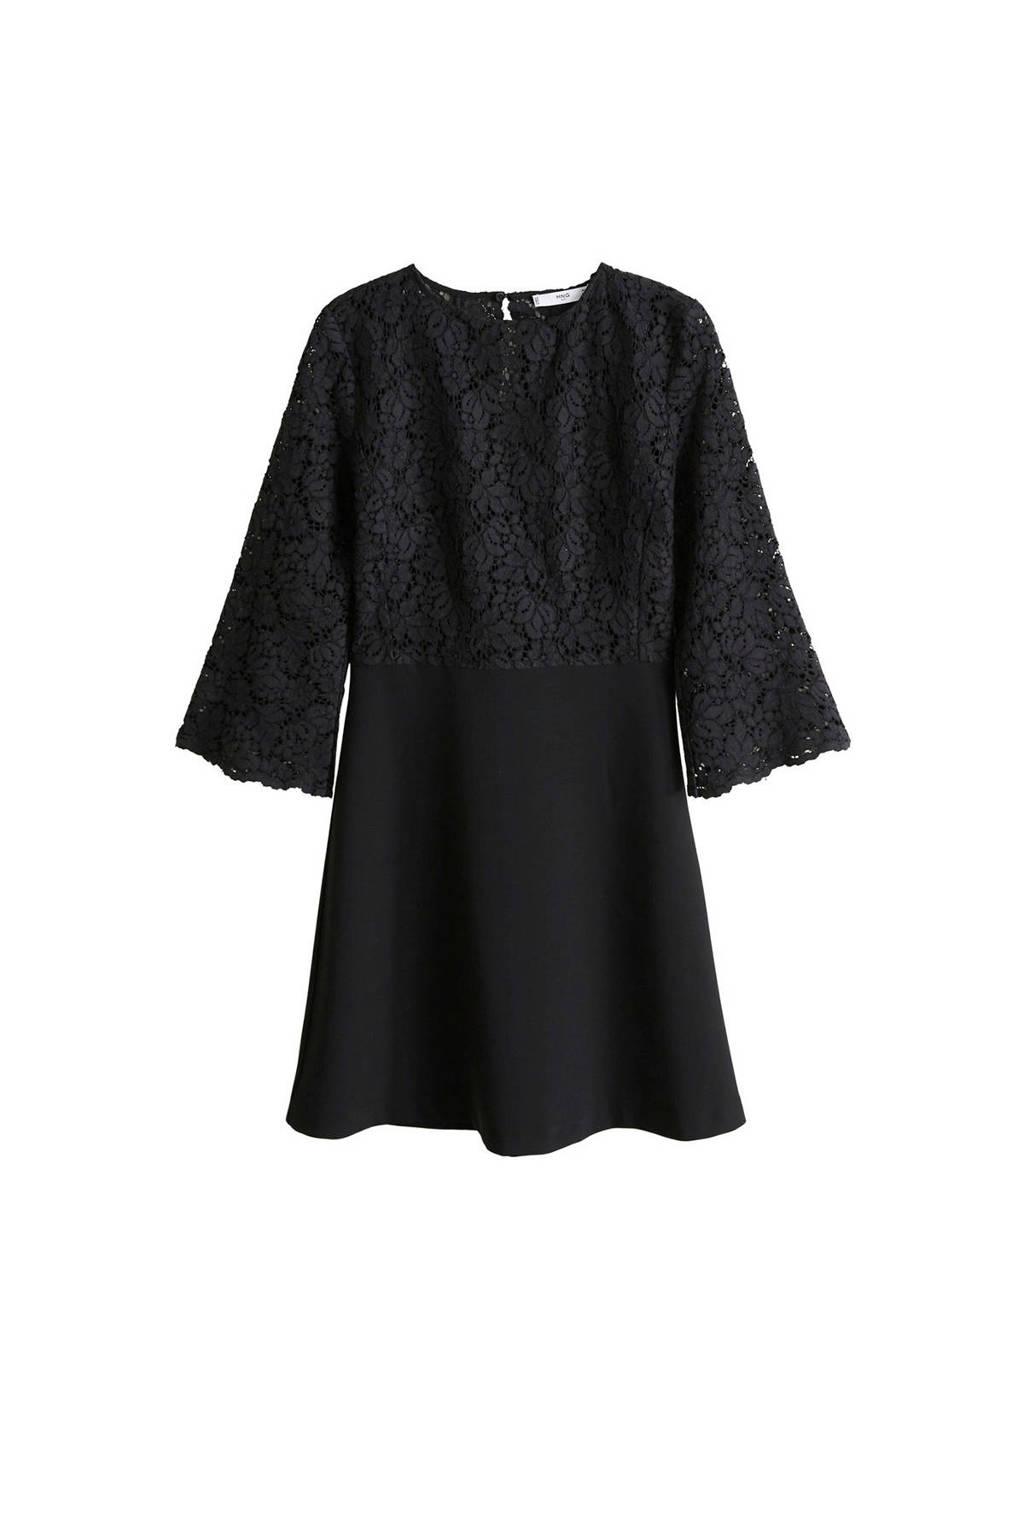 Mango jurk met kant zwart, Zwart